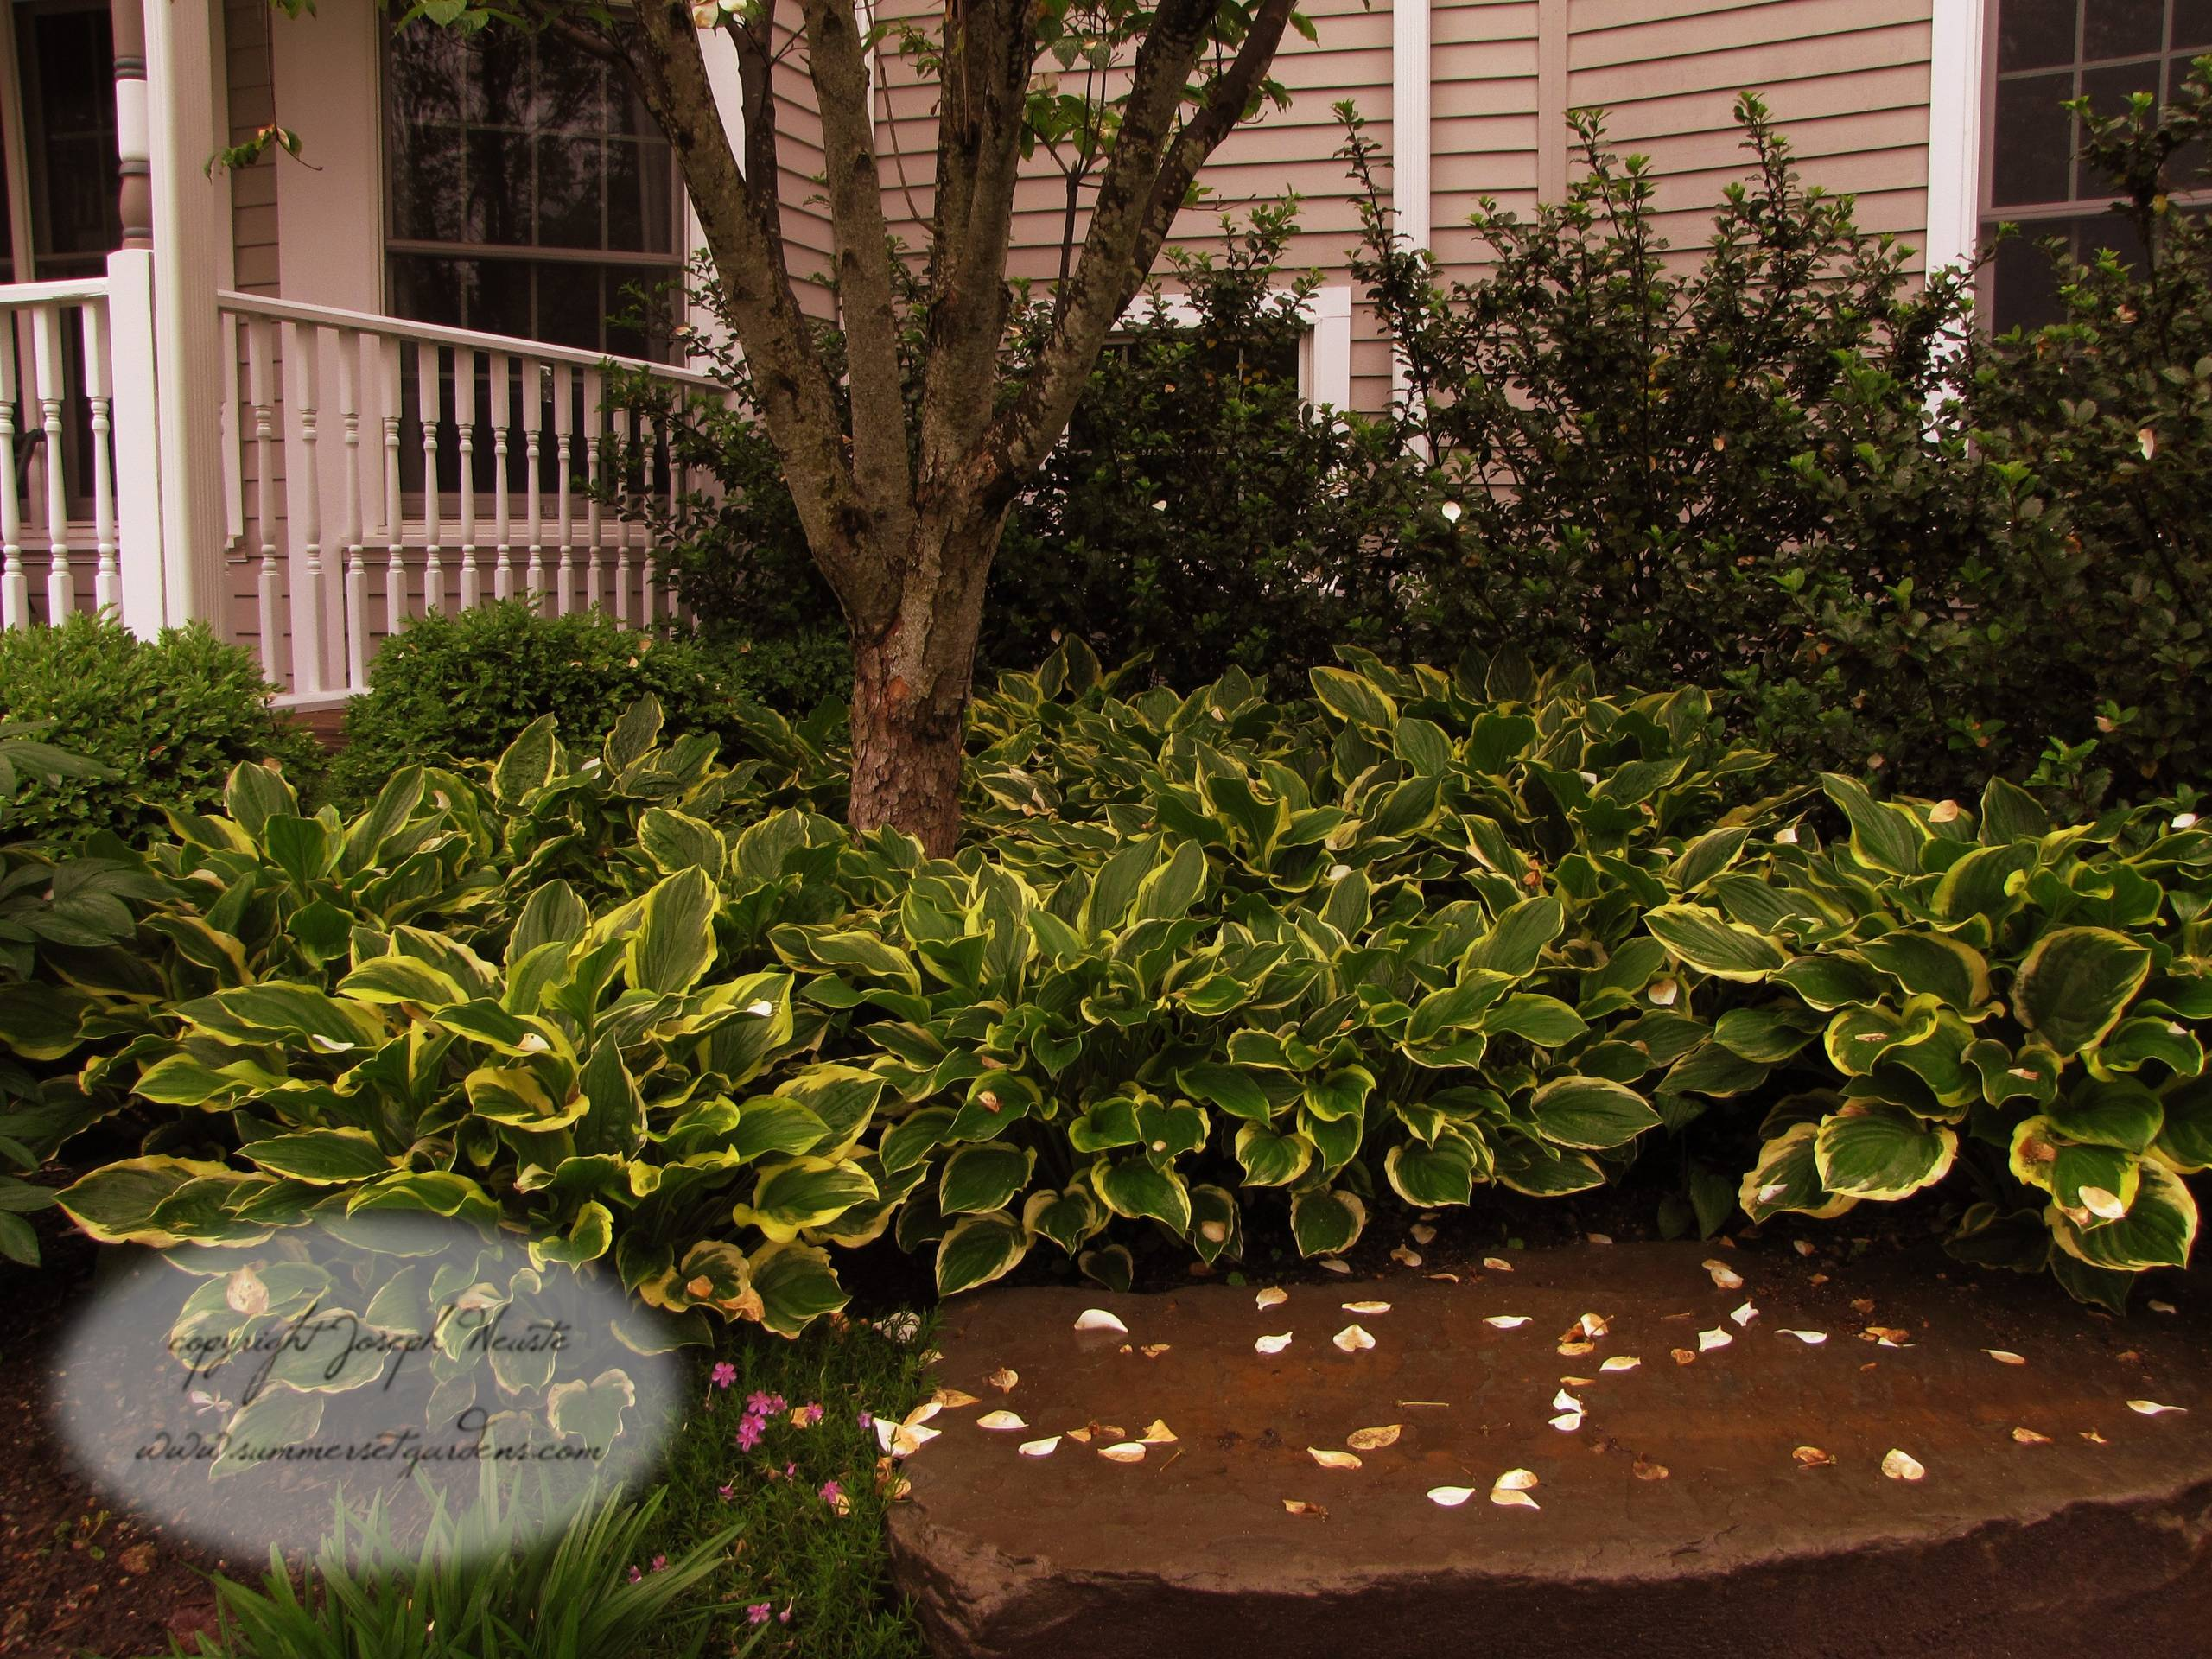 Hosta Gardens | Houzz on and hosta flower bed, hosta garden ideas around large tree, hosta garden design,